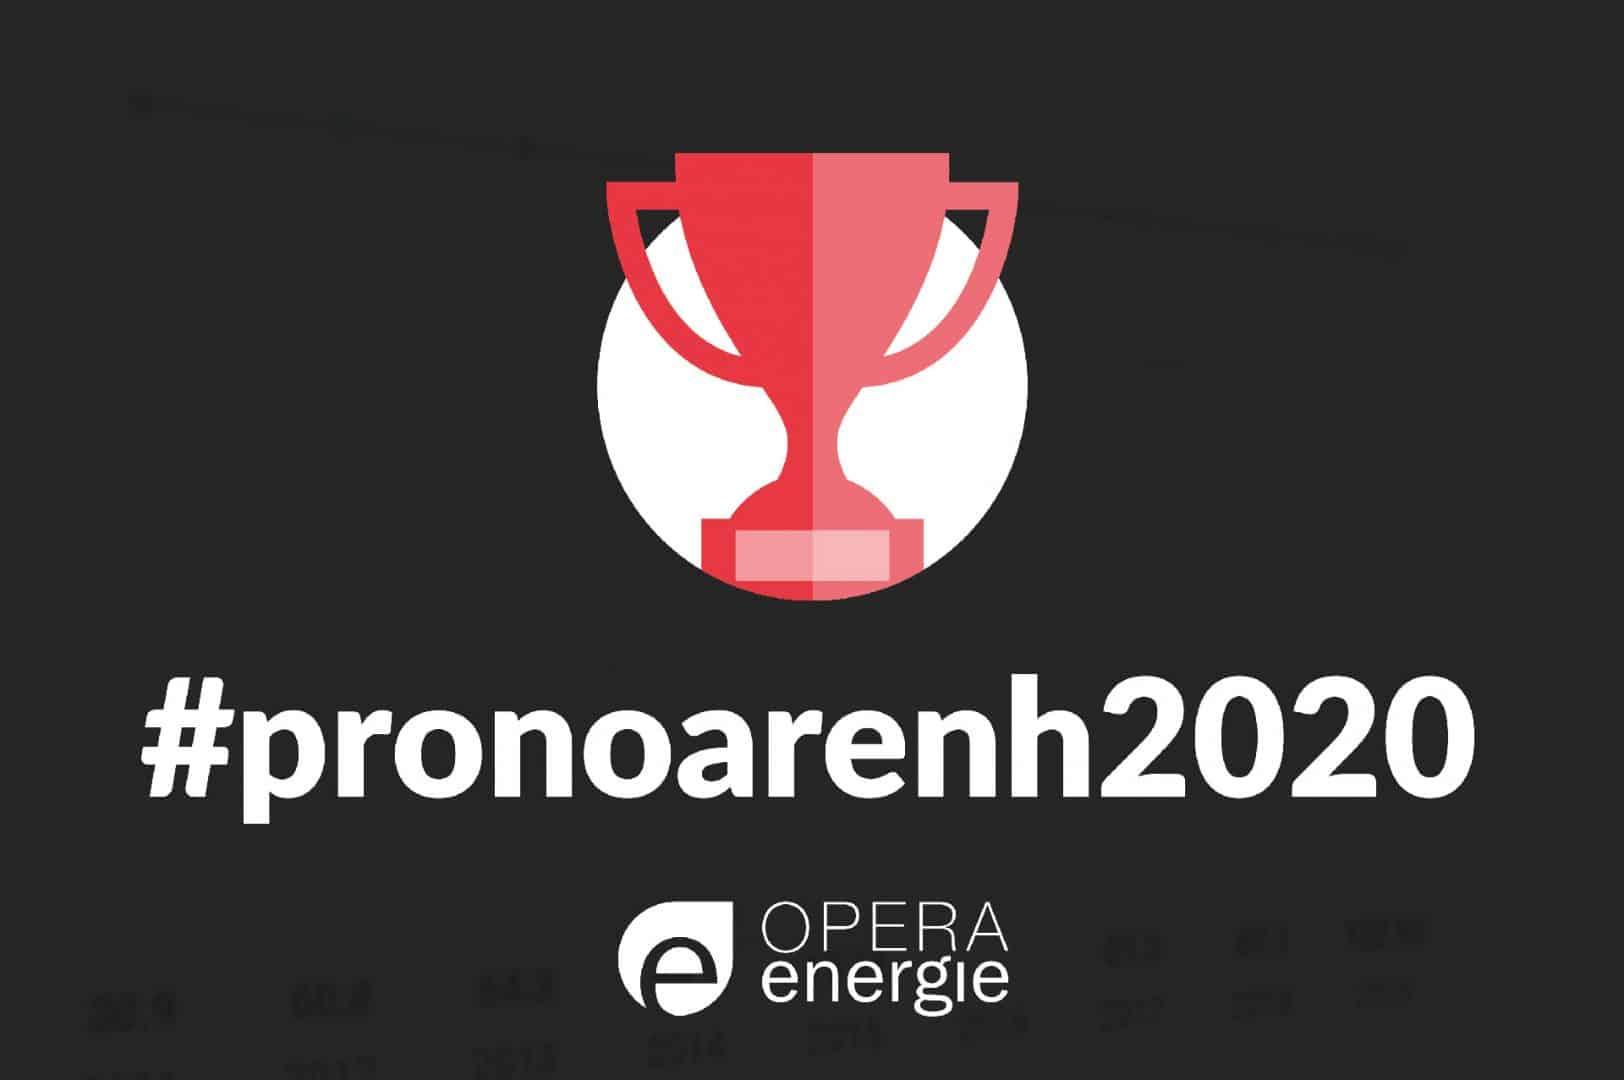 Opera-Energie_#pronoareh2020-gagnant